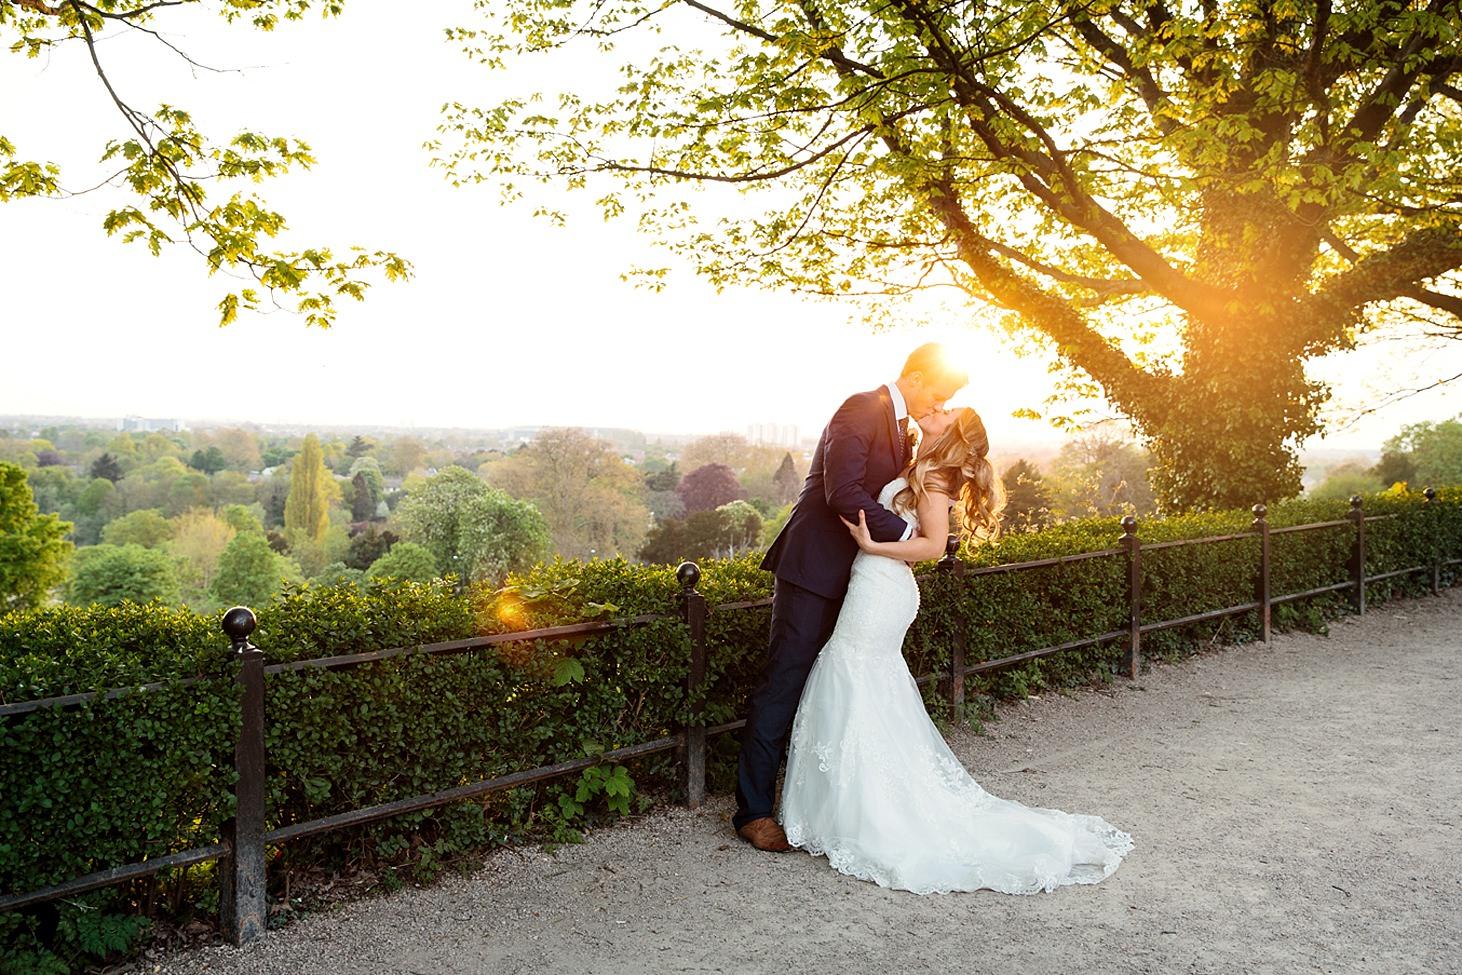 richmond hill wedding photography couple kiss